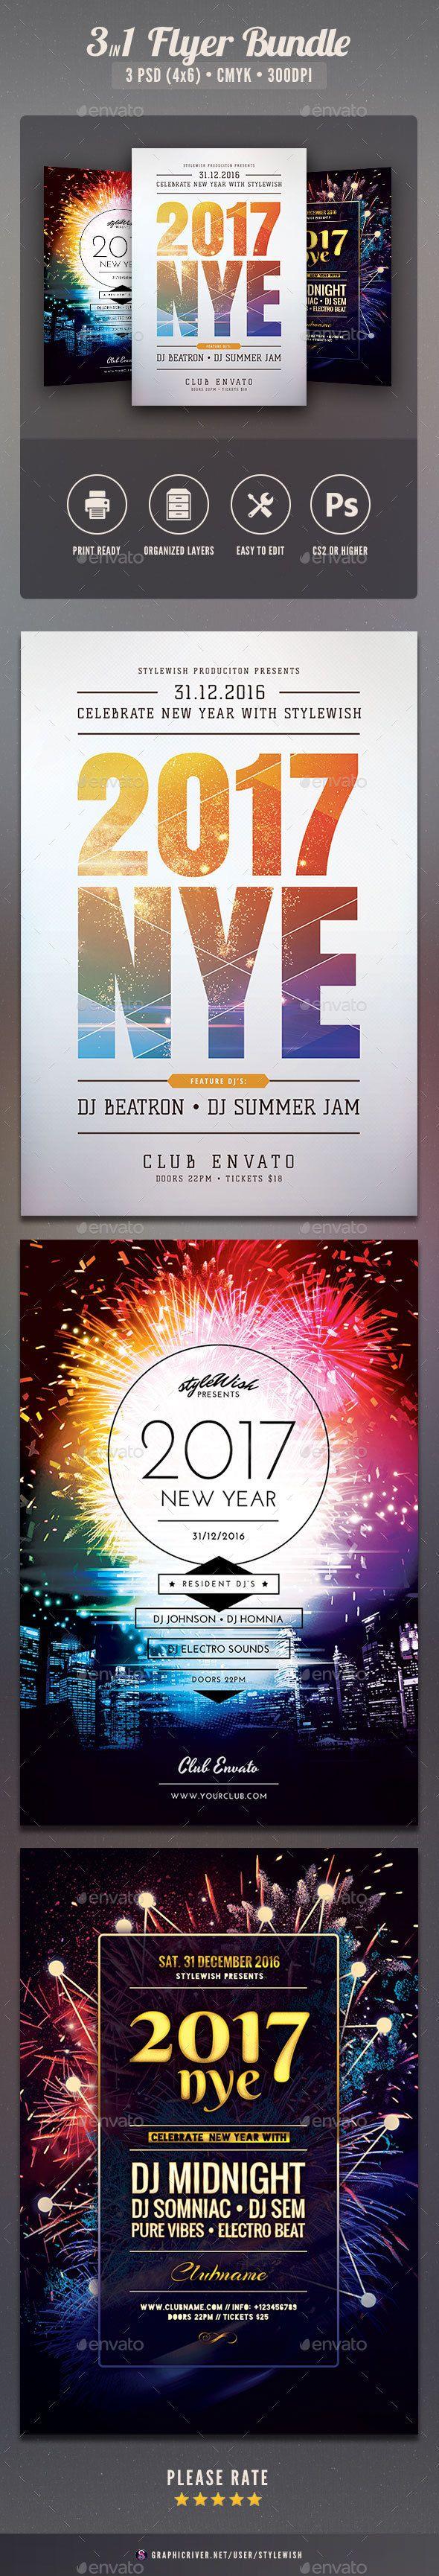 New year Flyer Bundle. Download: https://graphicriver.net/item/new-year-flyer-bundle-vol08/19208603?ref=thanhdesign